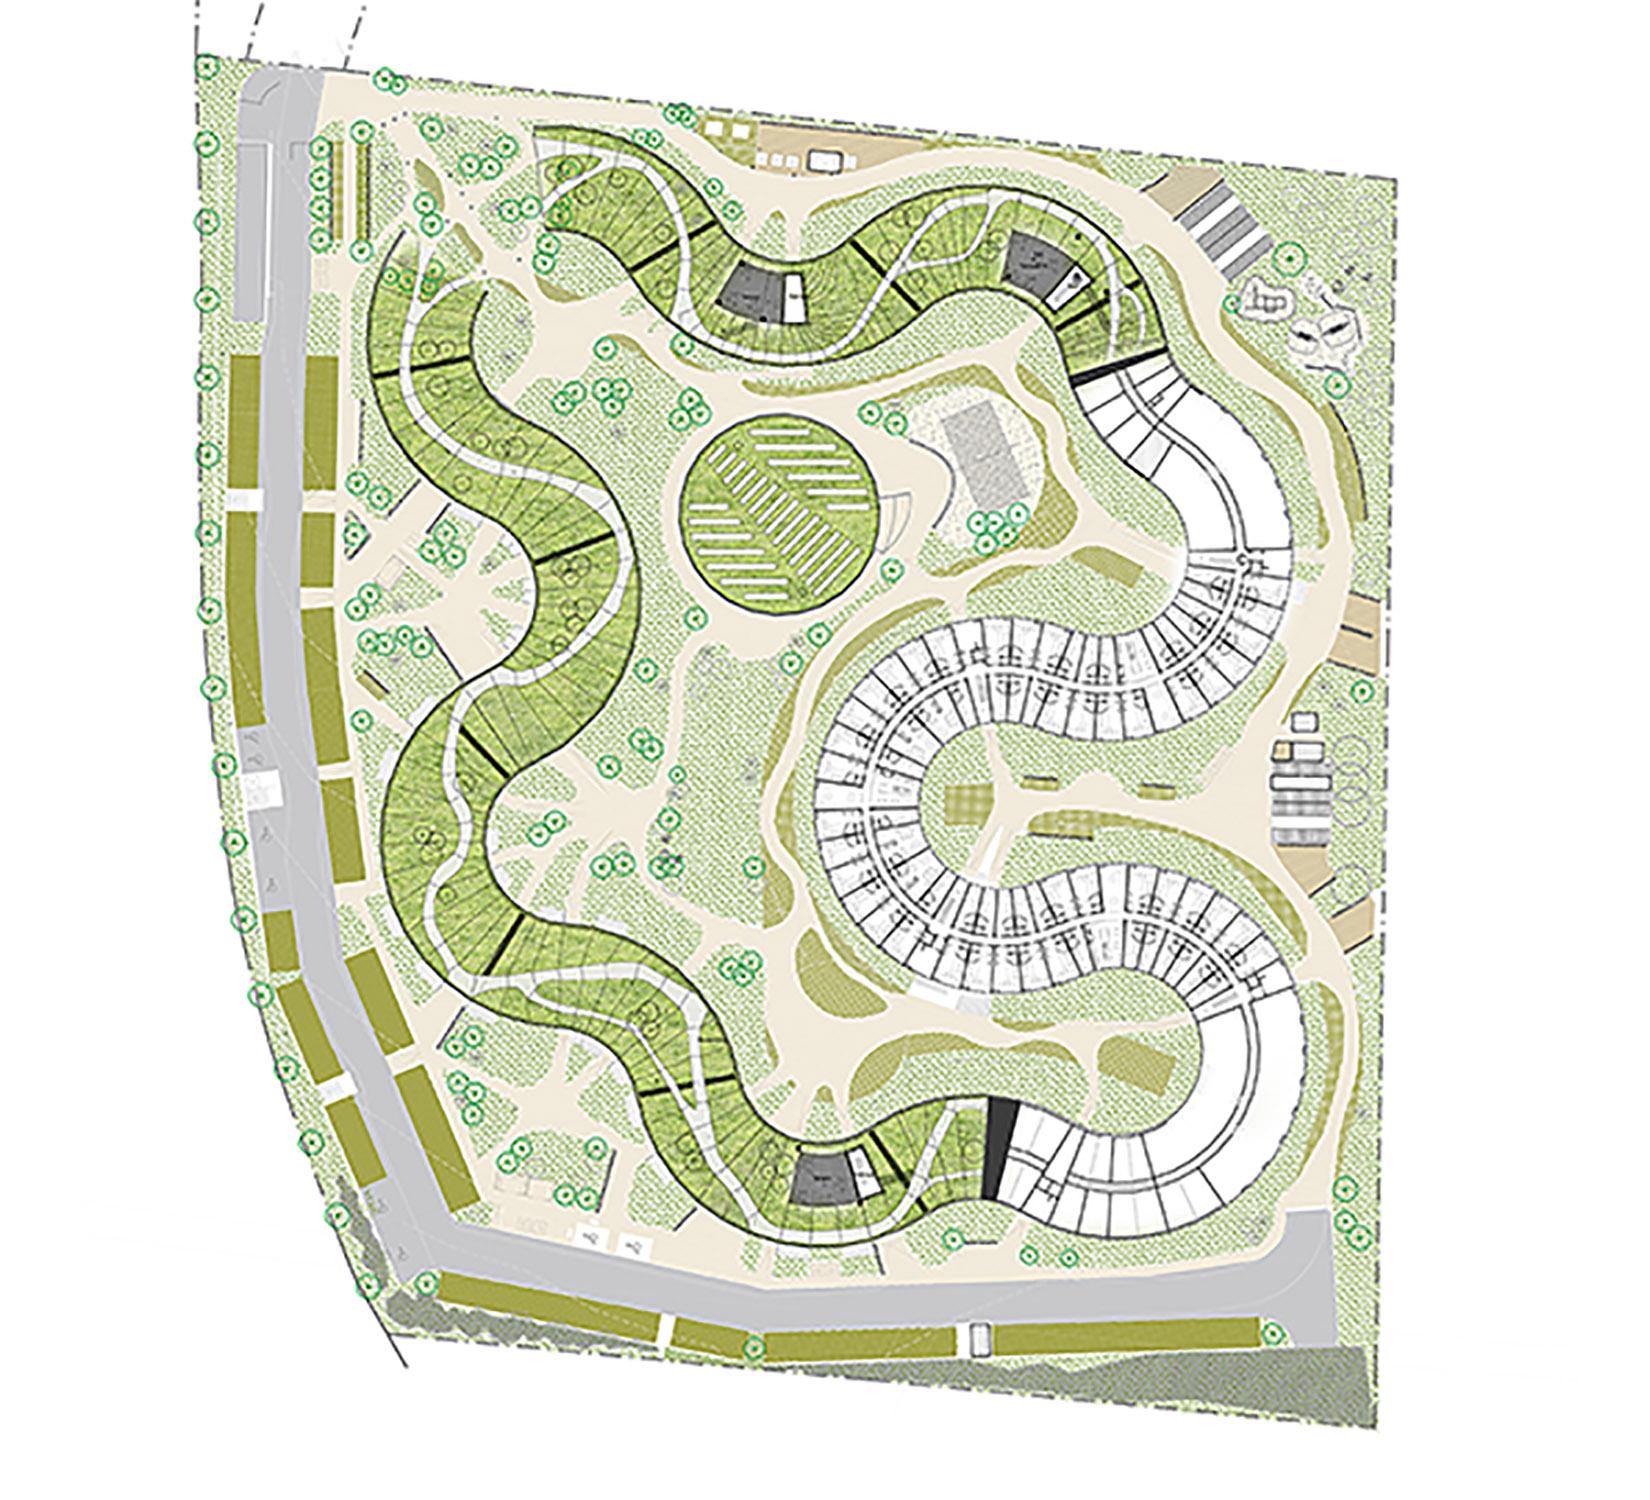 5th floor plan Lars Gitz Architects